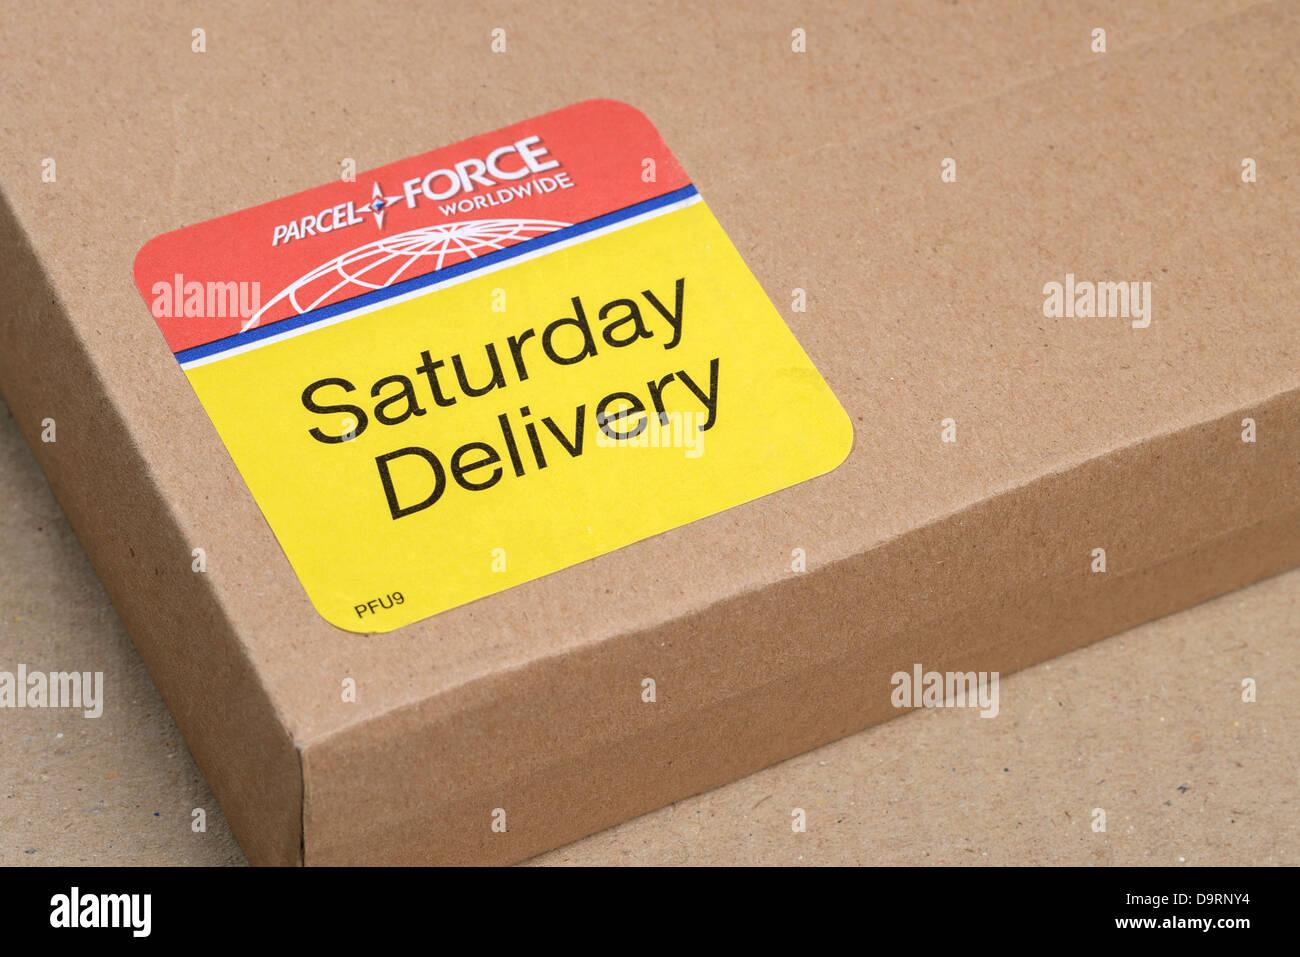 Parcel Force Saturday Delivery etiqueta adhesiva Imagen De Stock